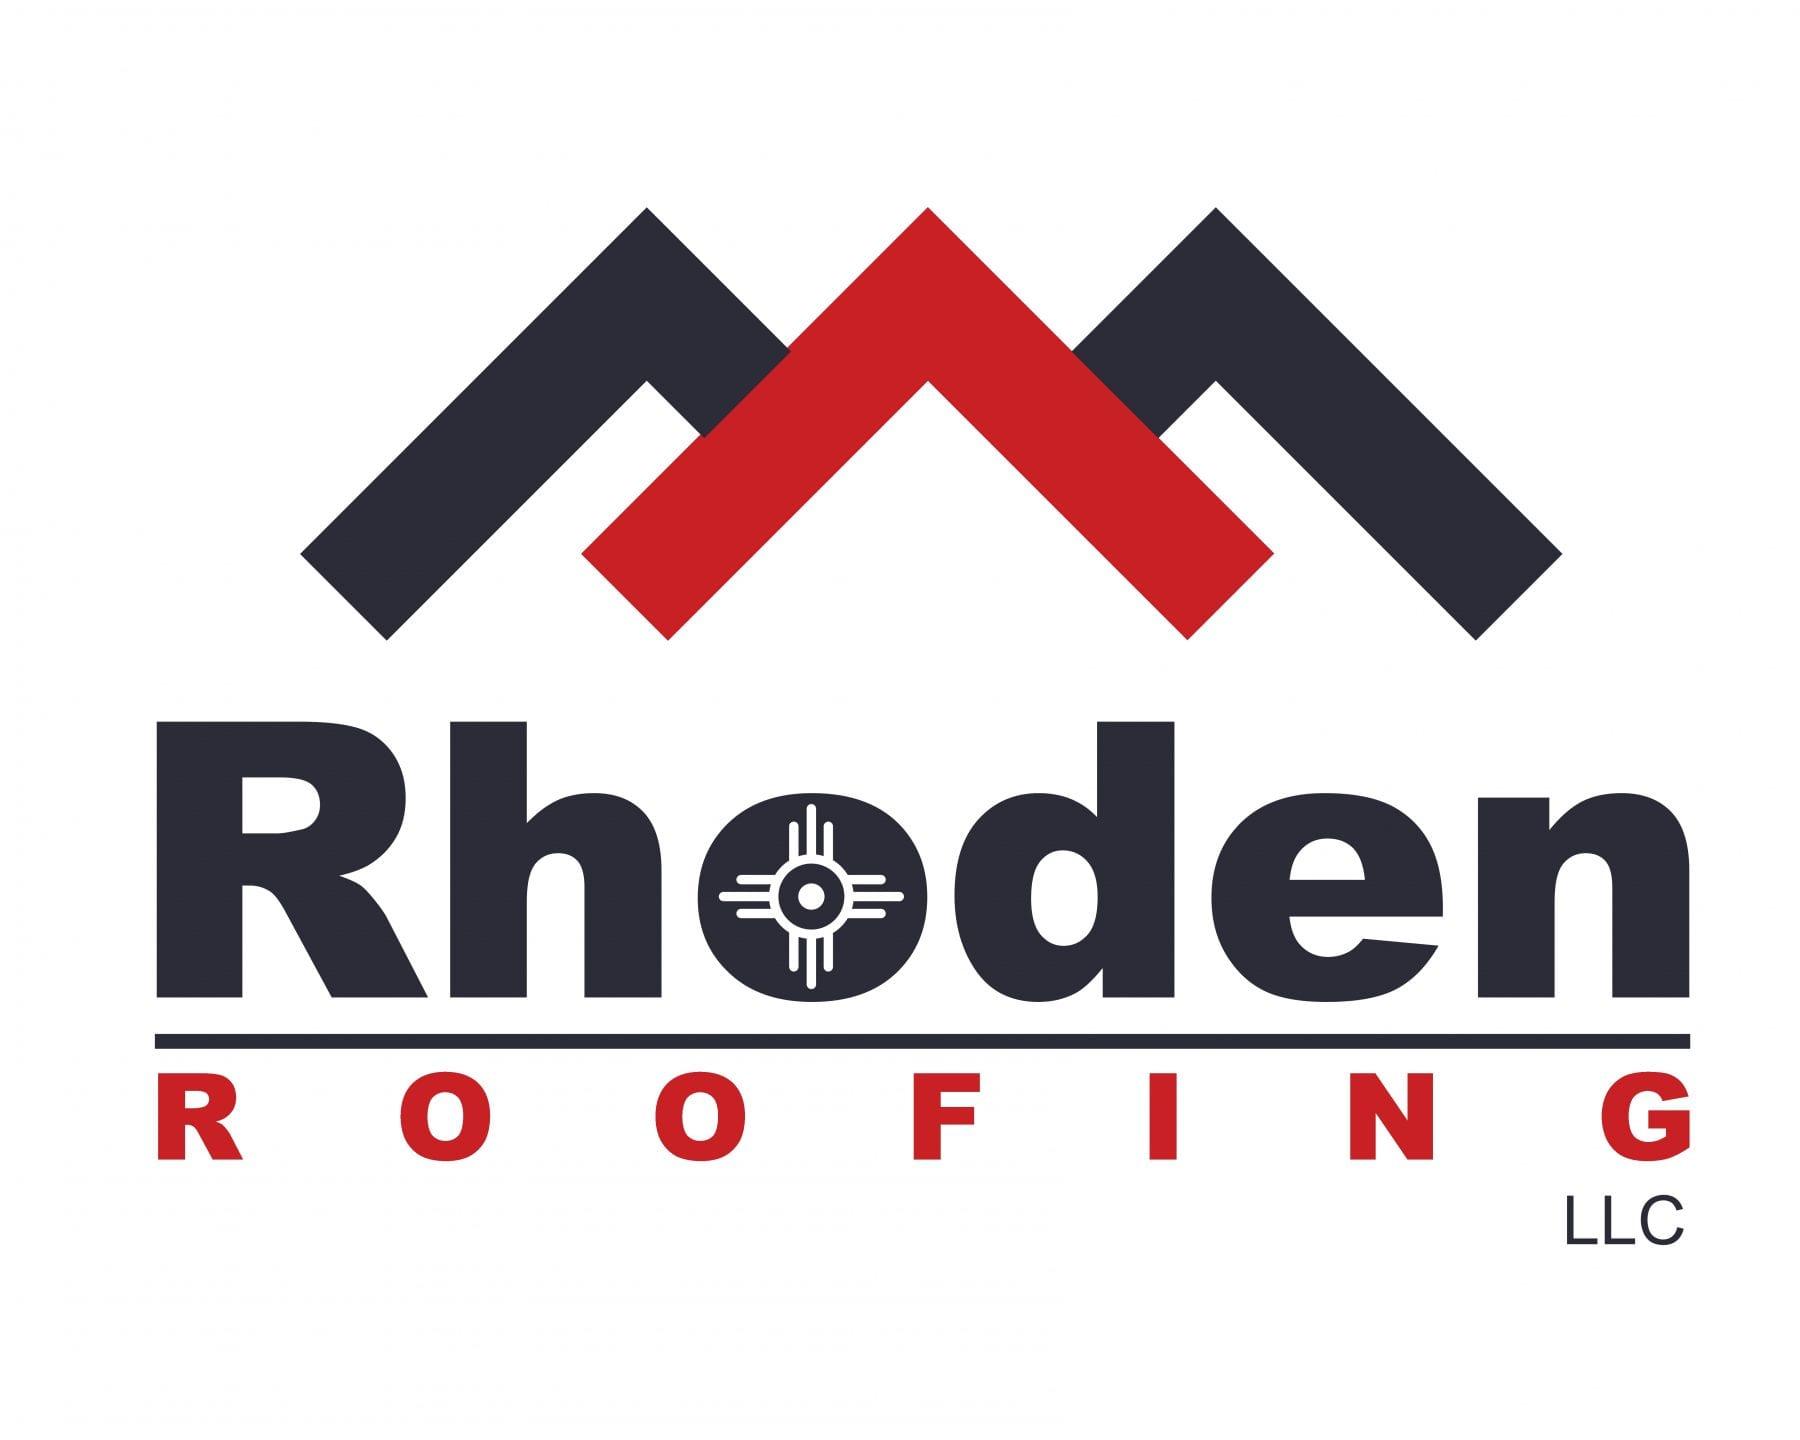 Rhoden Roofing